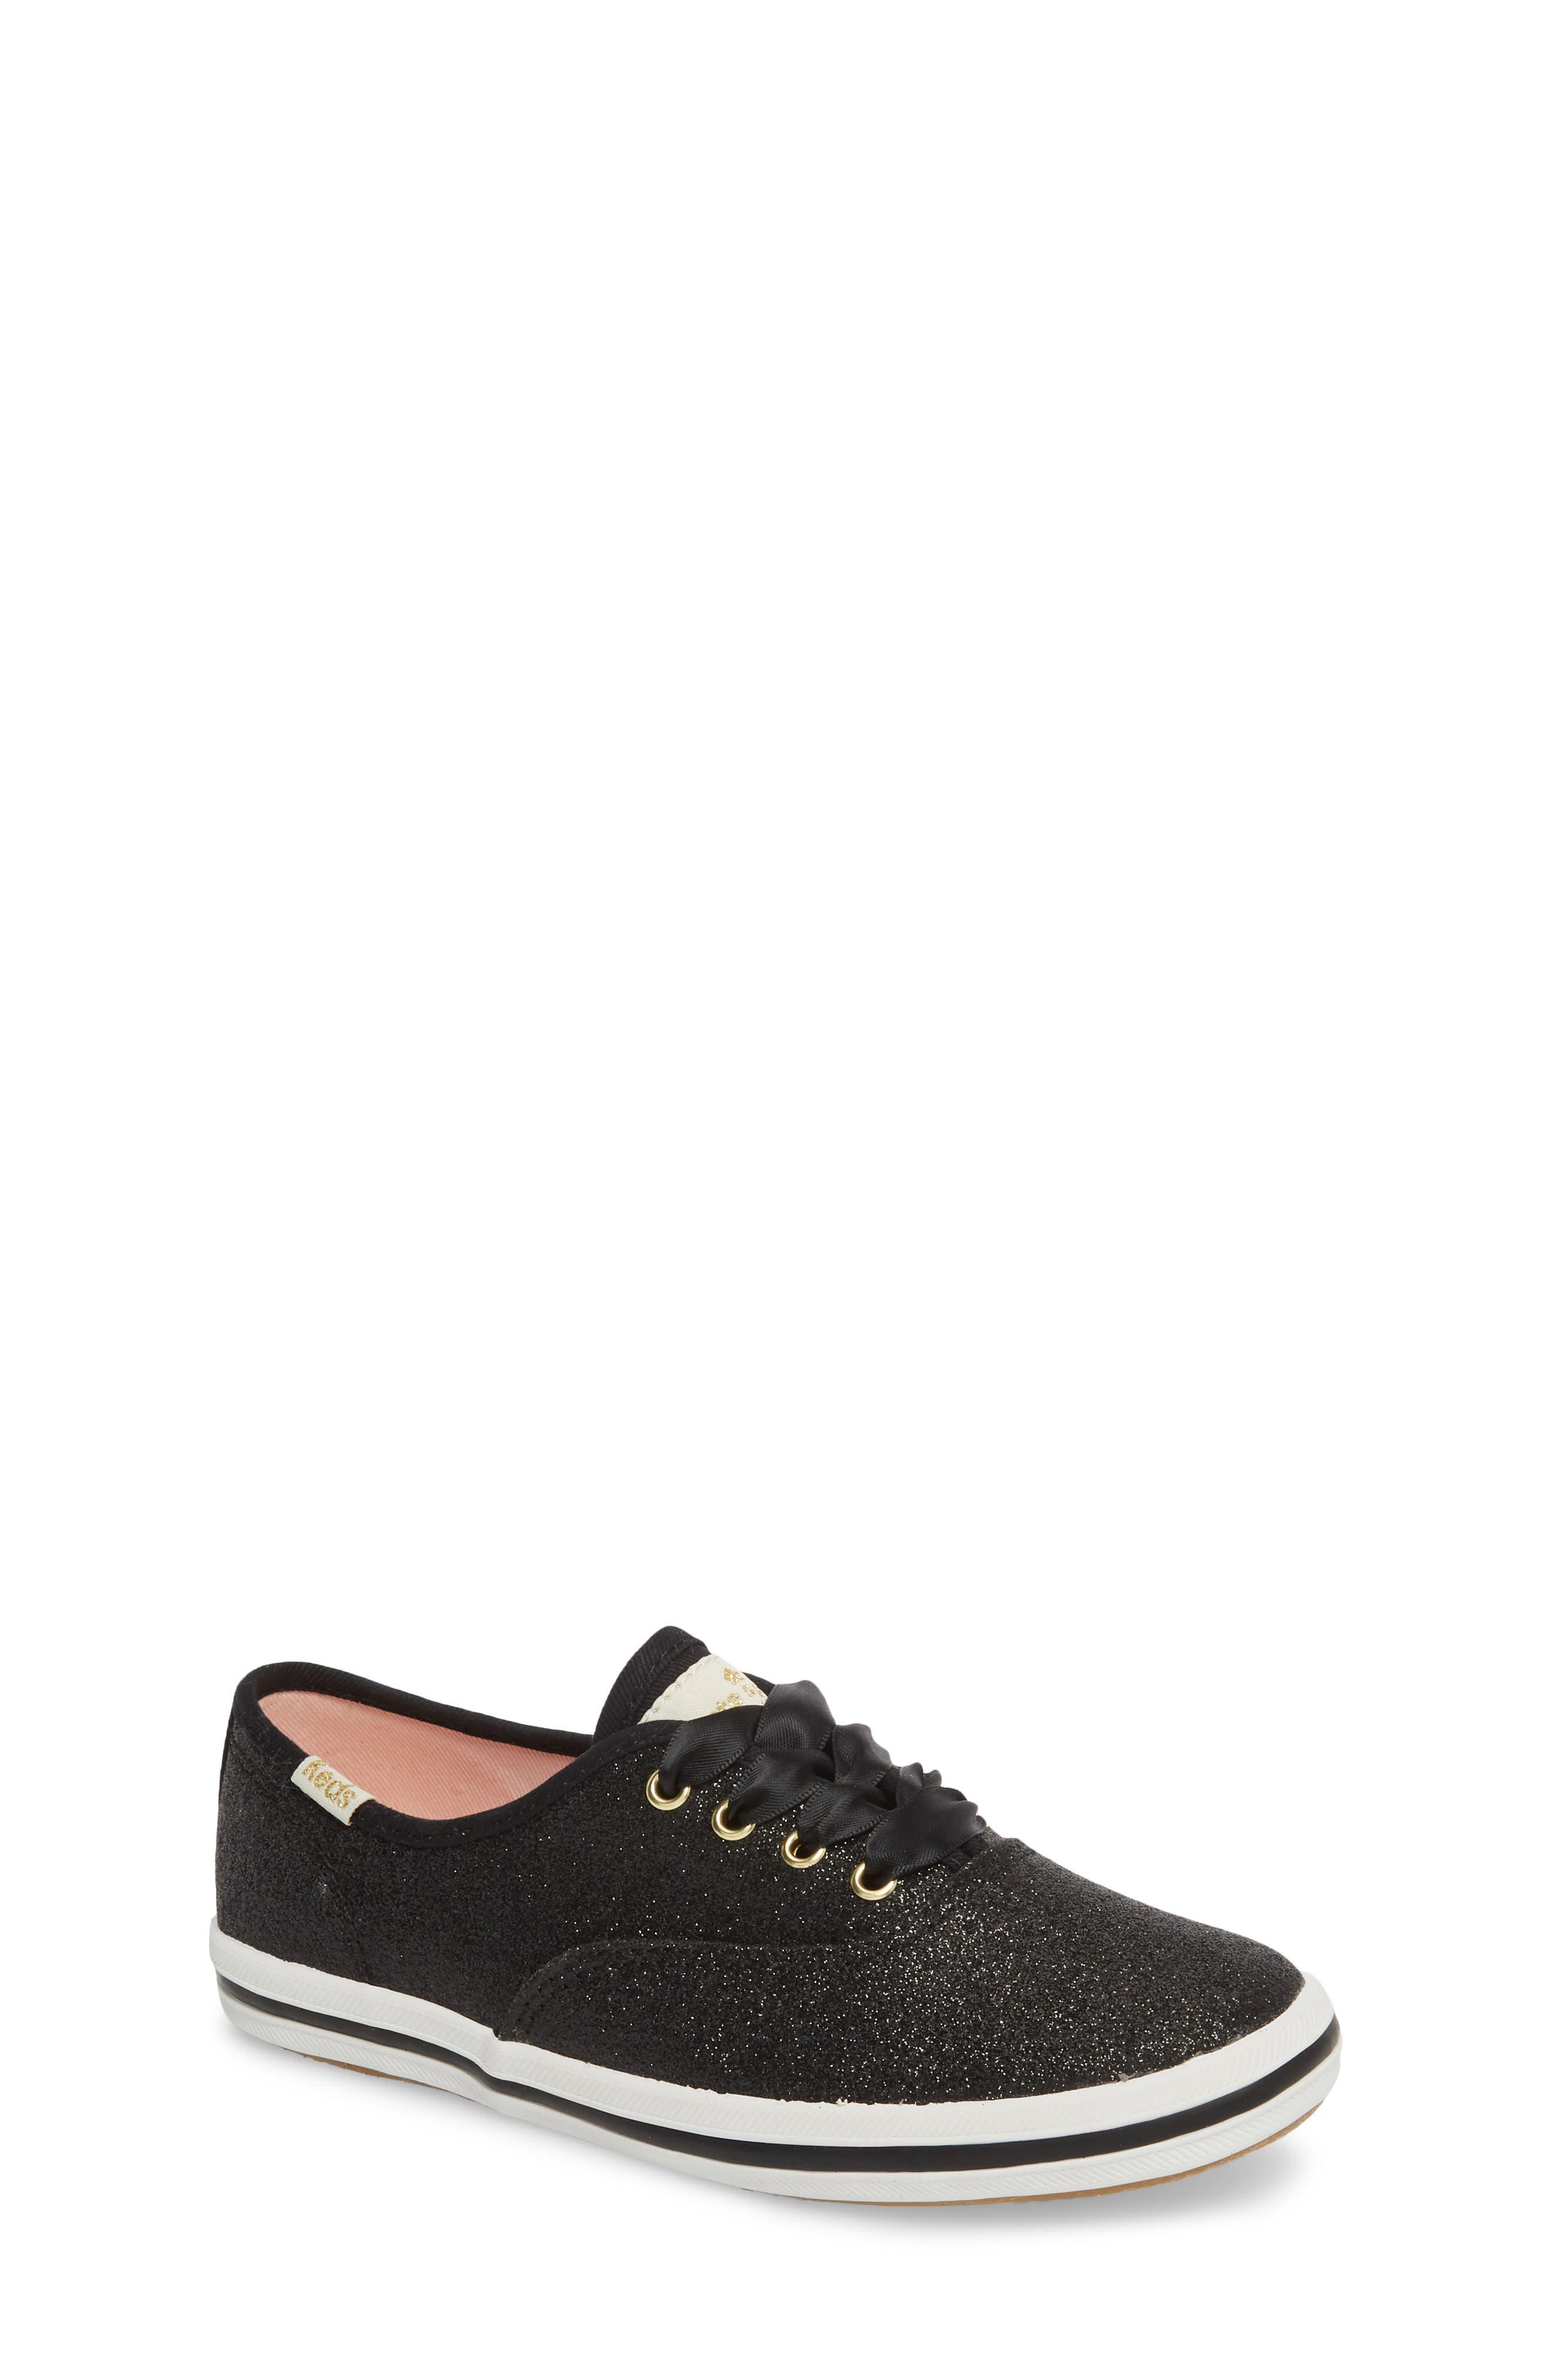 x kate spade new york Champion Glitter Sneaker,                             Main thumbnail 1, color,                             Black